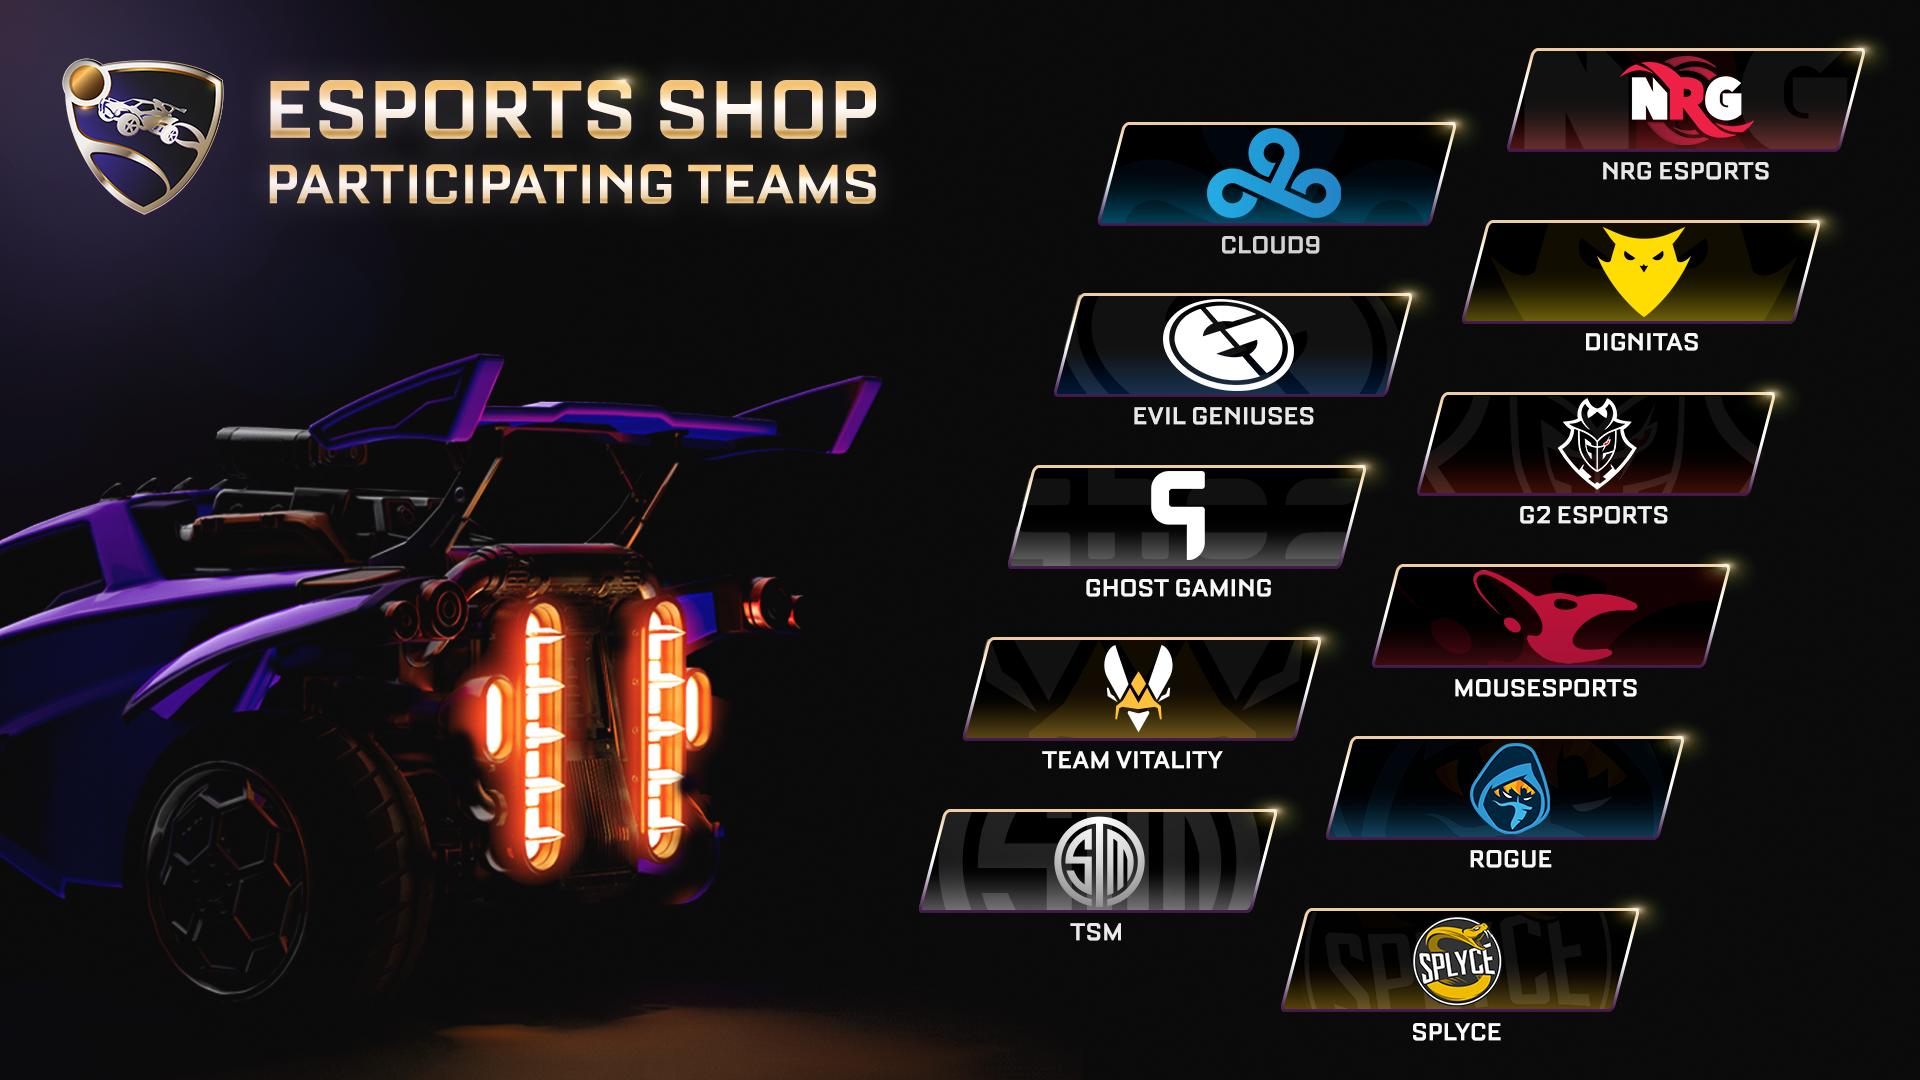 949ee898e The Esports Shop: A Closer Look | Rocket League® - Official Site